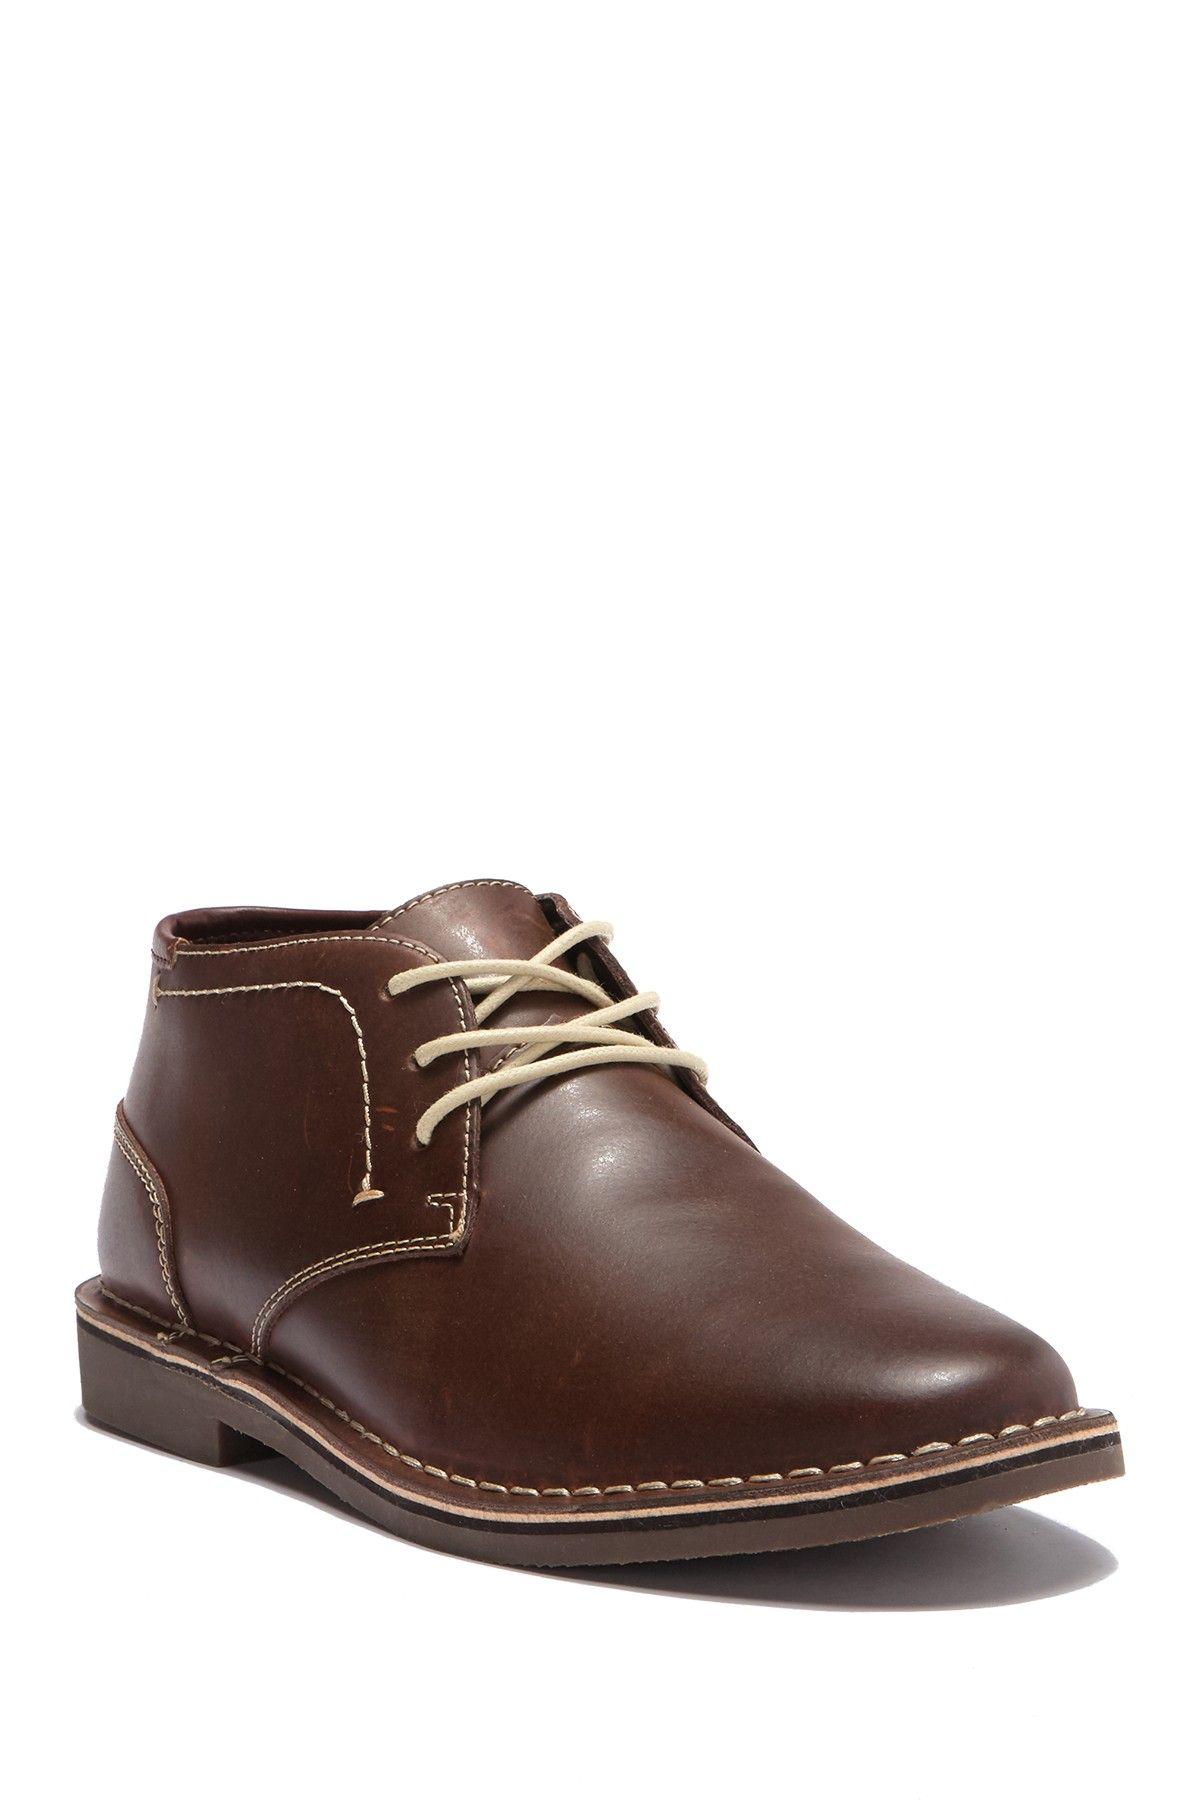 3a1818cccf79 Desert Sun Leather Chukka Boot - Wide Width Available